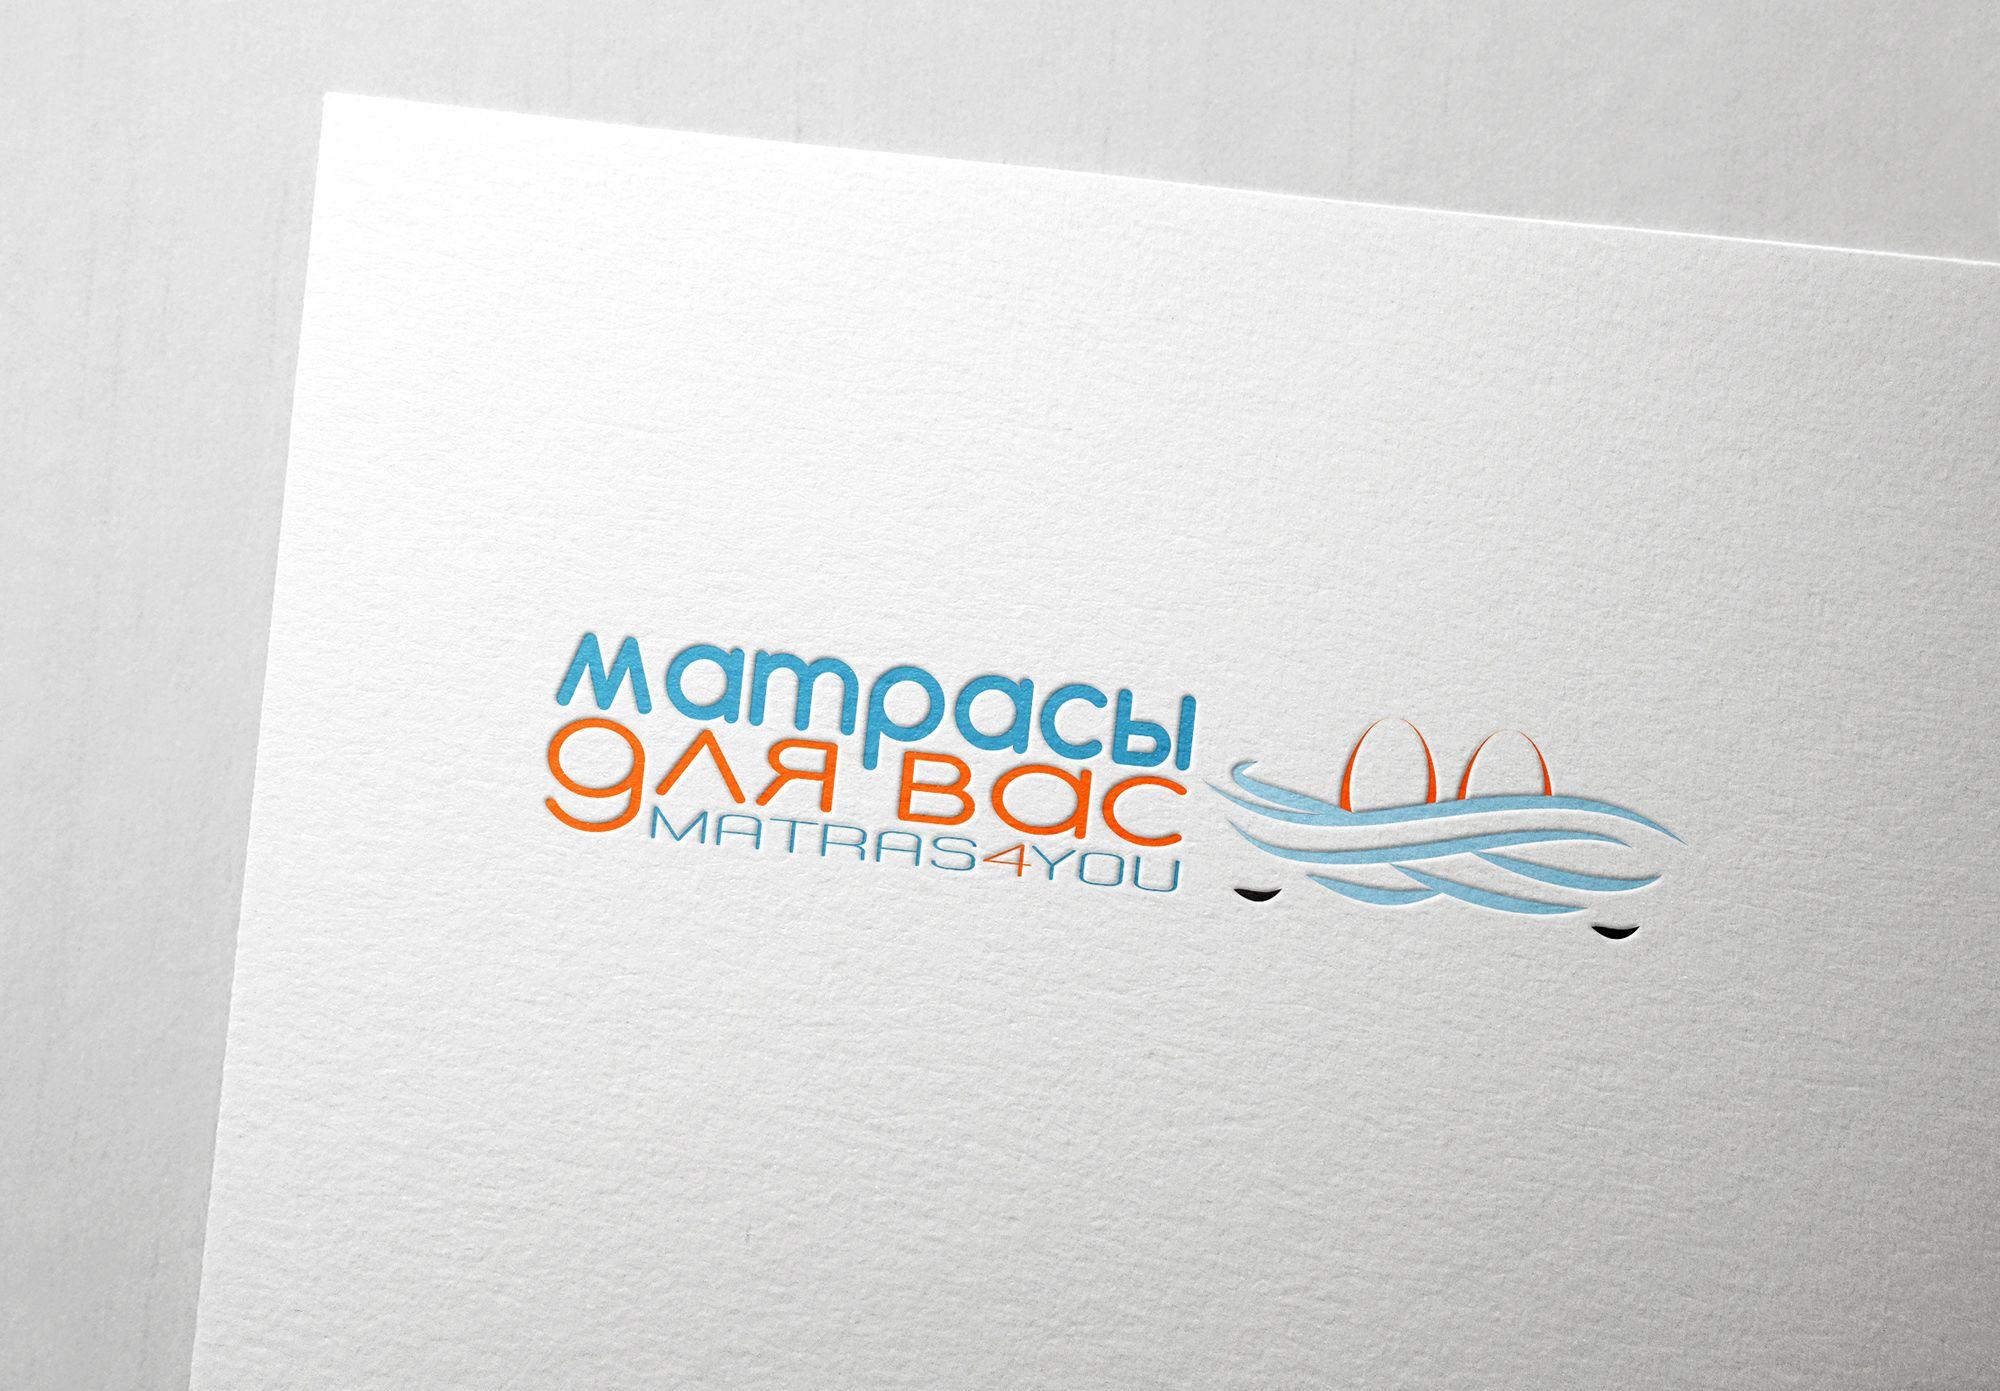 matras4u - дизайнер trocky18